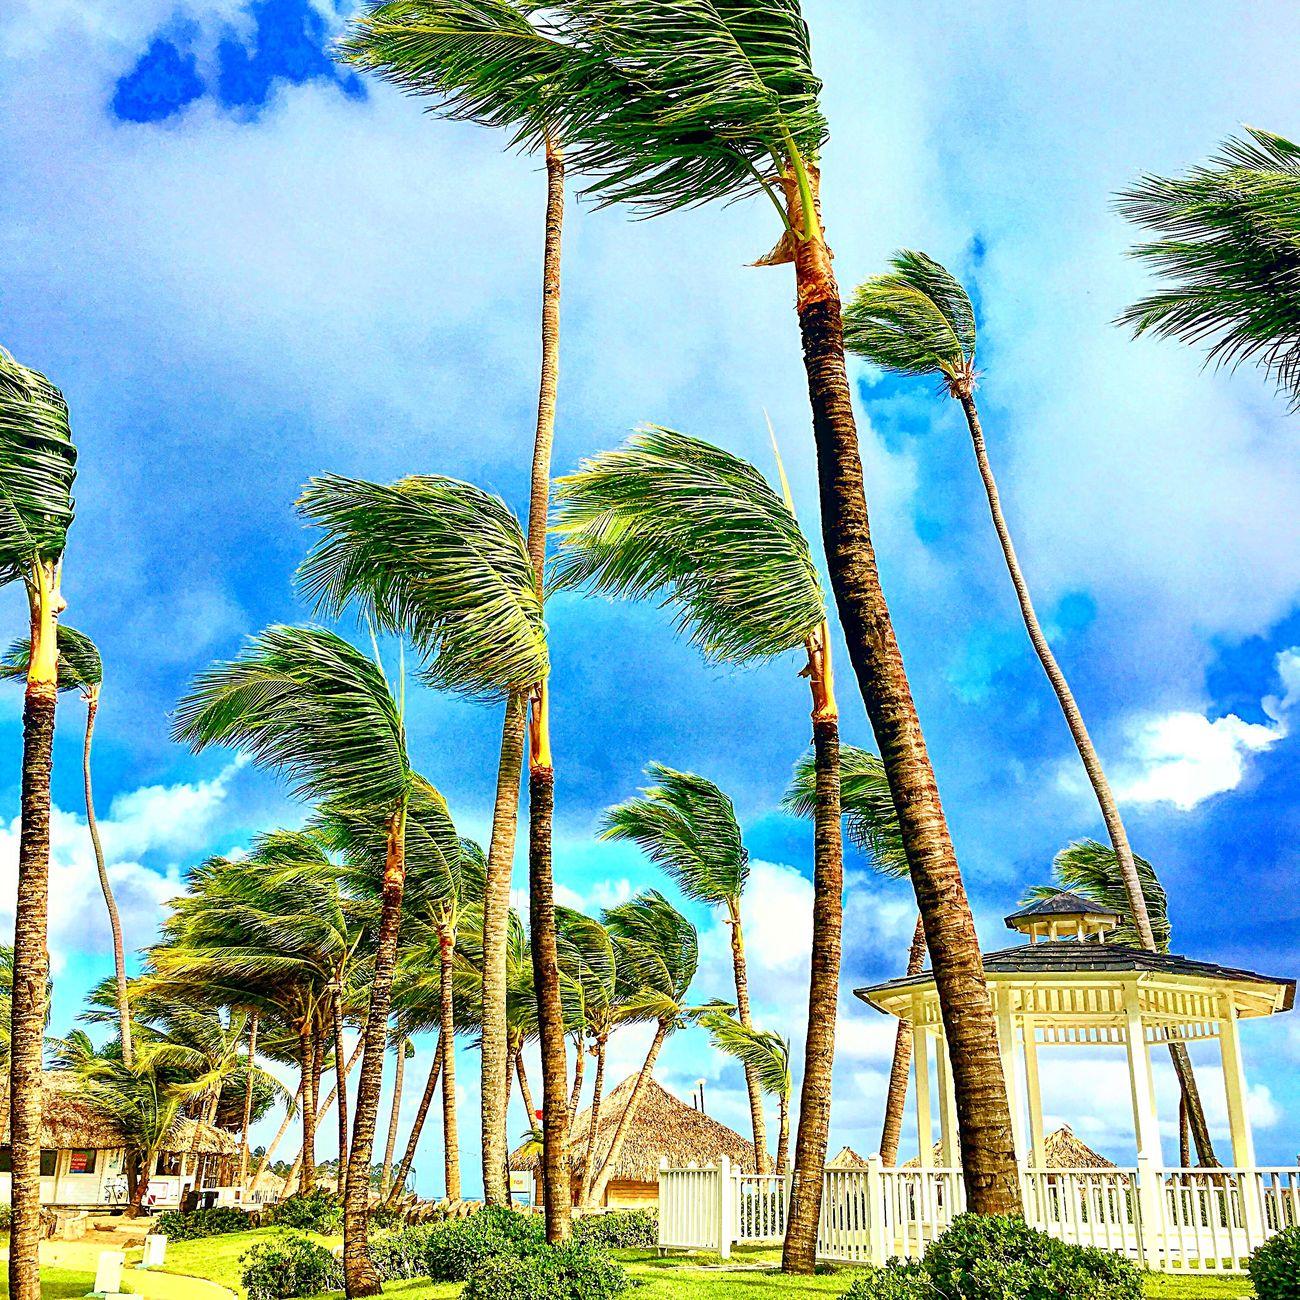 Strong winds Travel Sunshine Beach Sunshine ☀ Palm Tree Colors Exploring Bright Clouds Adventure Traveladdict Wind Notinkansasanymoretoto Landscape Strong Wind EyeEm Best Shots Beachphotography Pergola Eyem Gallery Outdoors Travelphotography Light